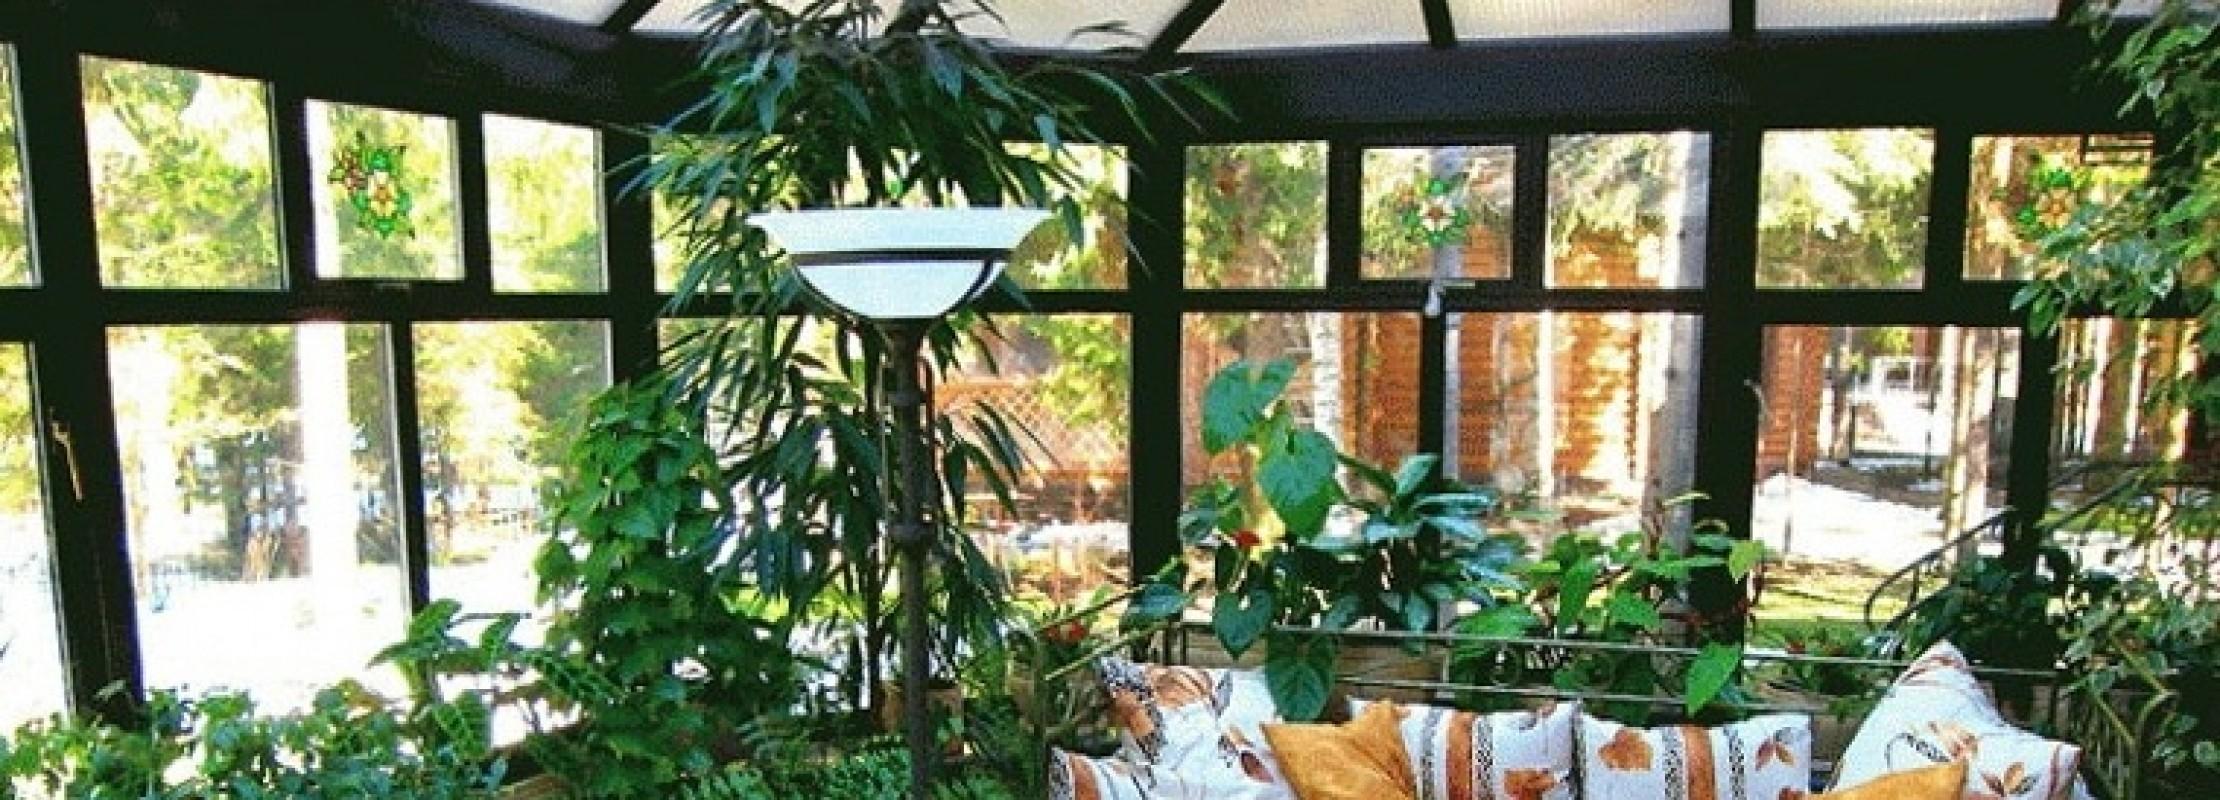 Come Costruire Una Amaca.Creare Un Giardino D Inverno Blog Edilnet